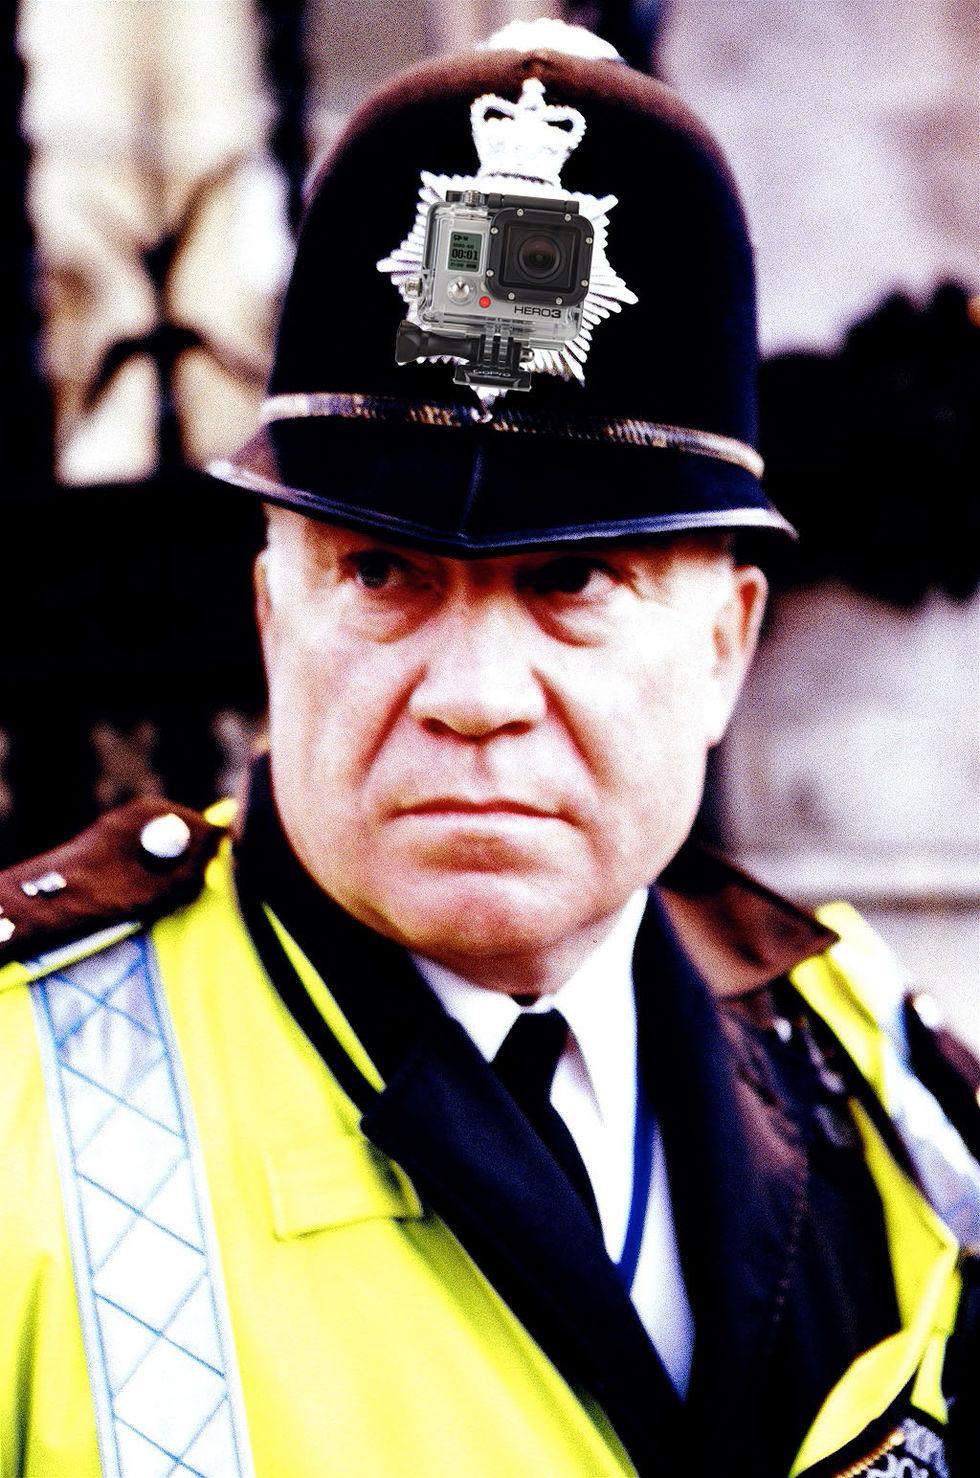 Londonpolisen utrustas med kameror